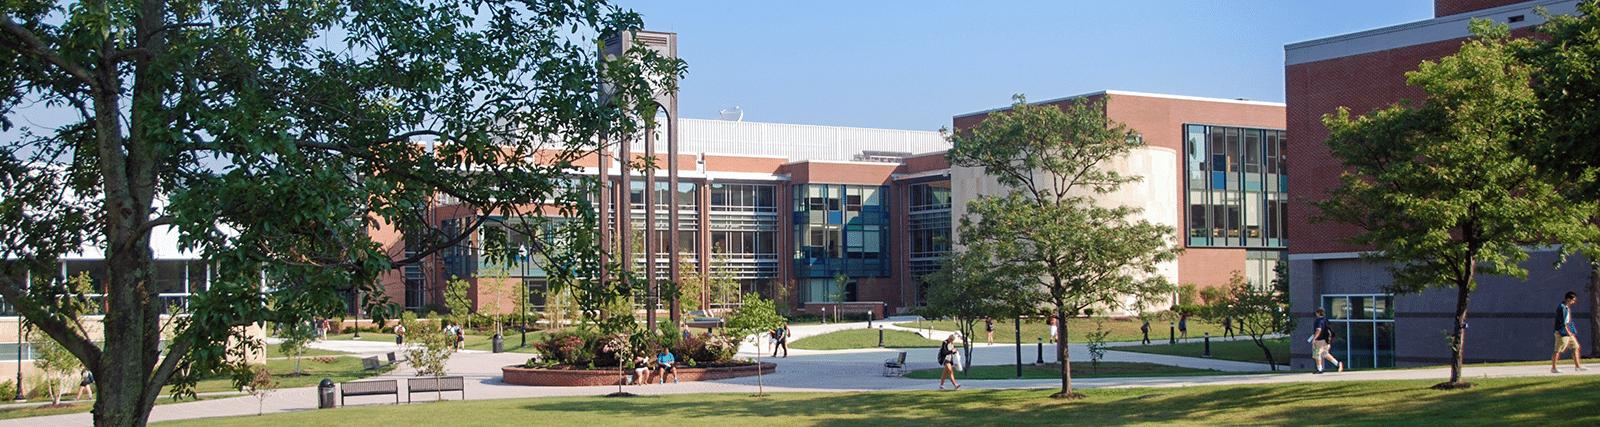 Frostburg State University - University Advancement Division